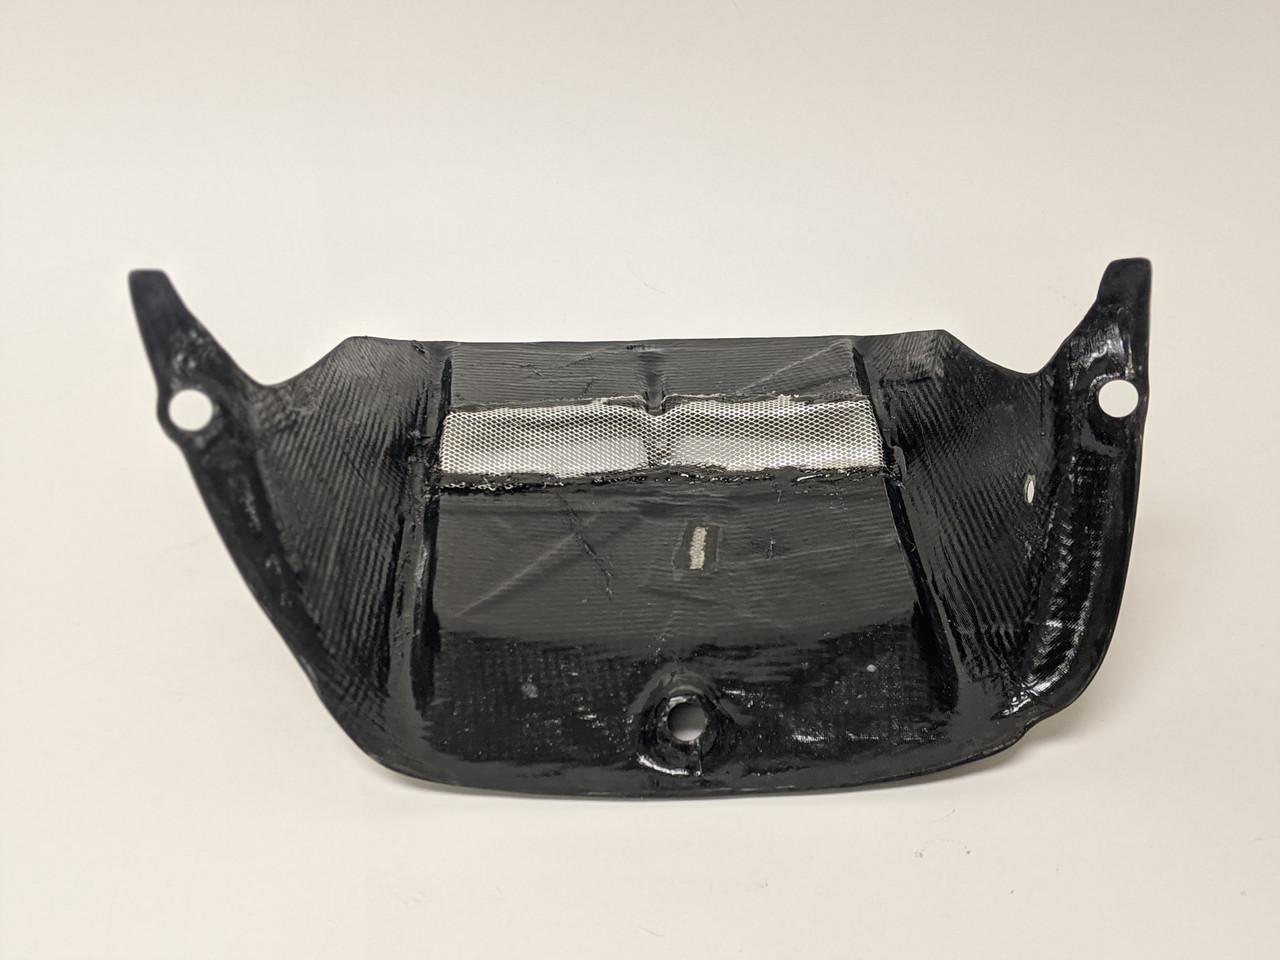 Rear Hugger in 100% Carbon Fiber for Yamaha R6 2006+